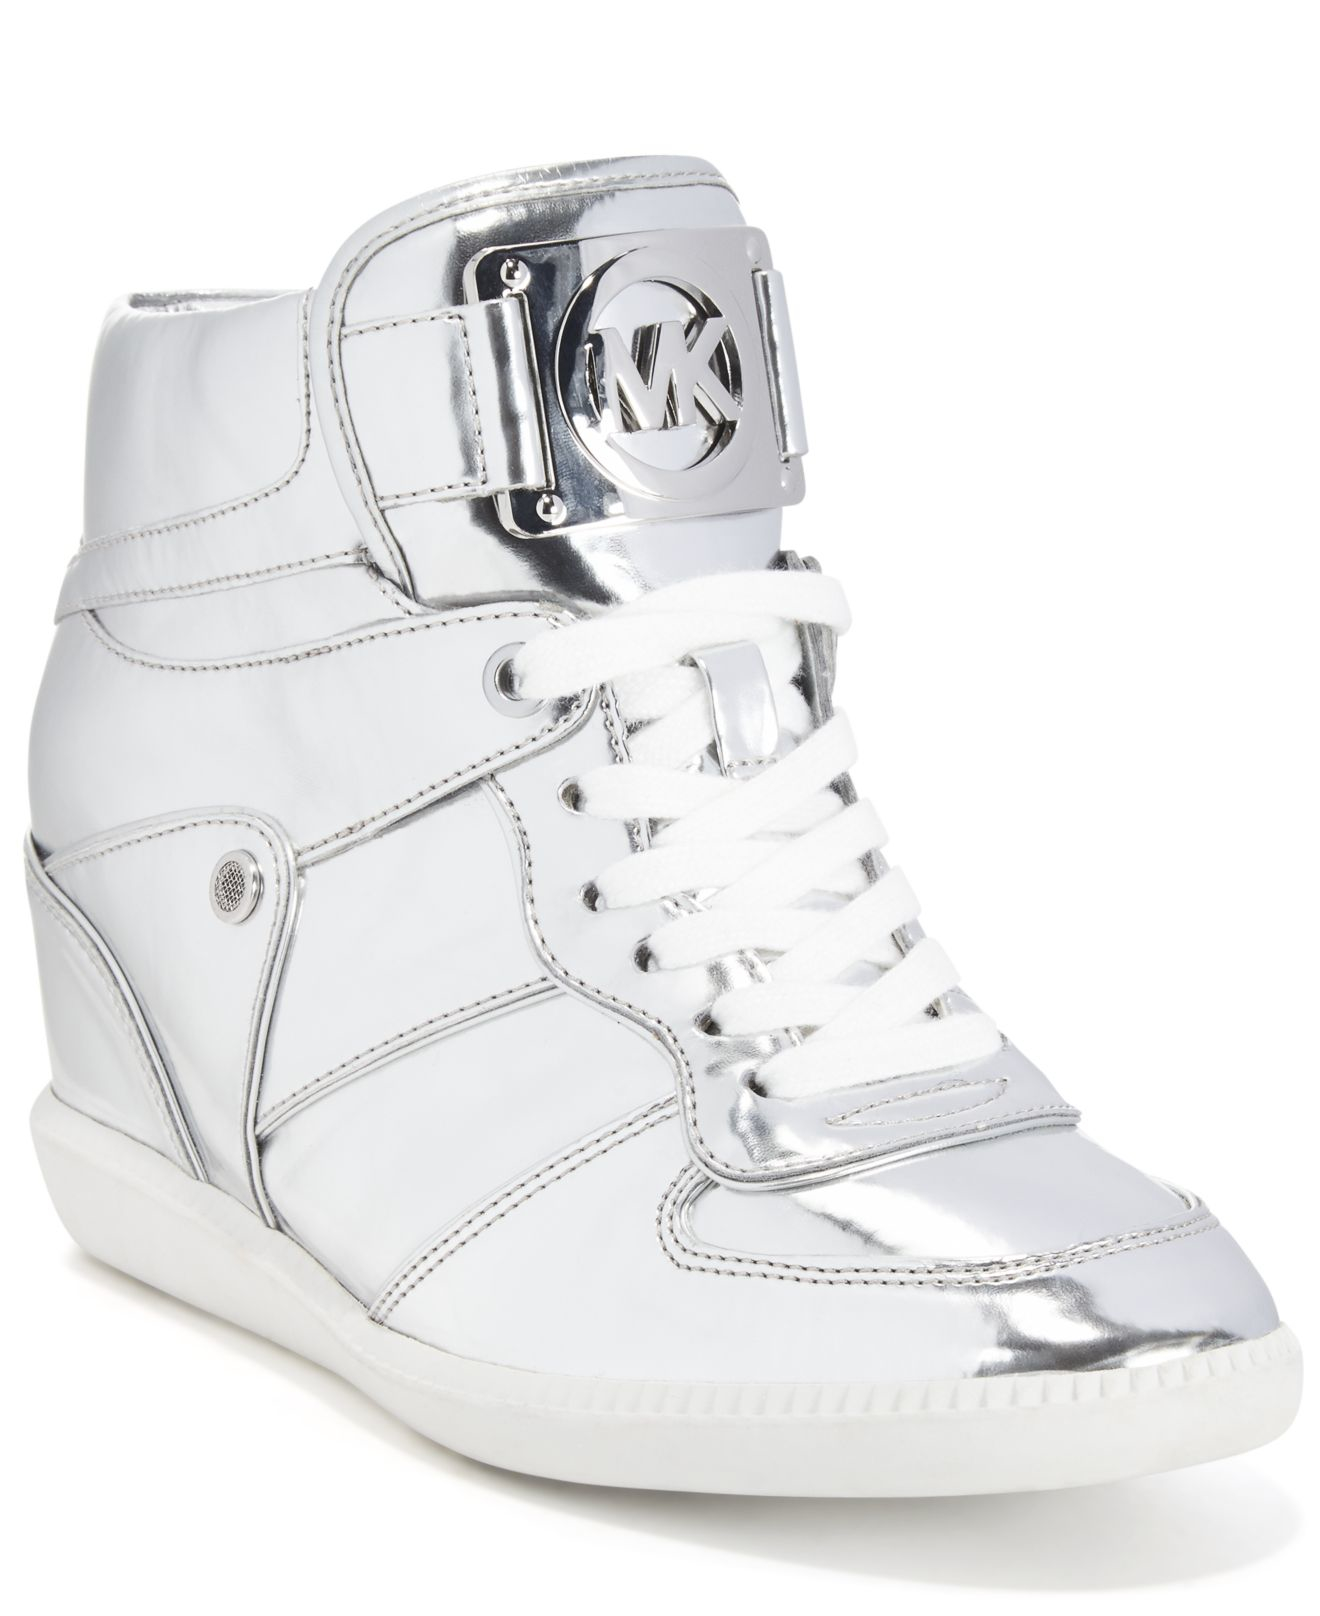 6867f329c612a MICHAEL KORS koturny buty damskie srebrne nikko 37 - 7147983239 ...